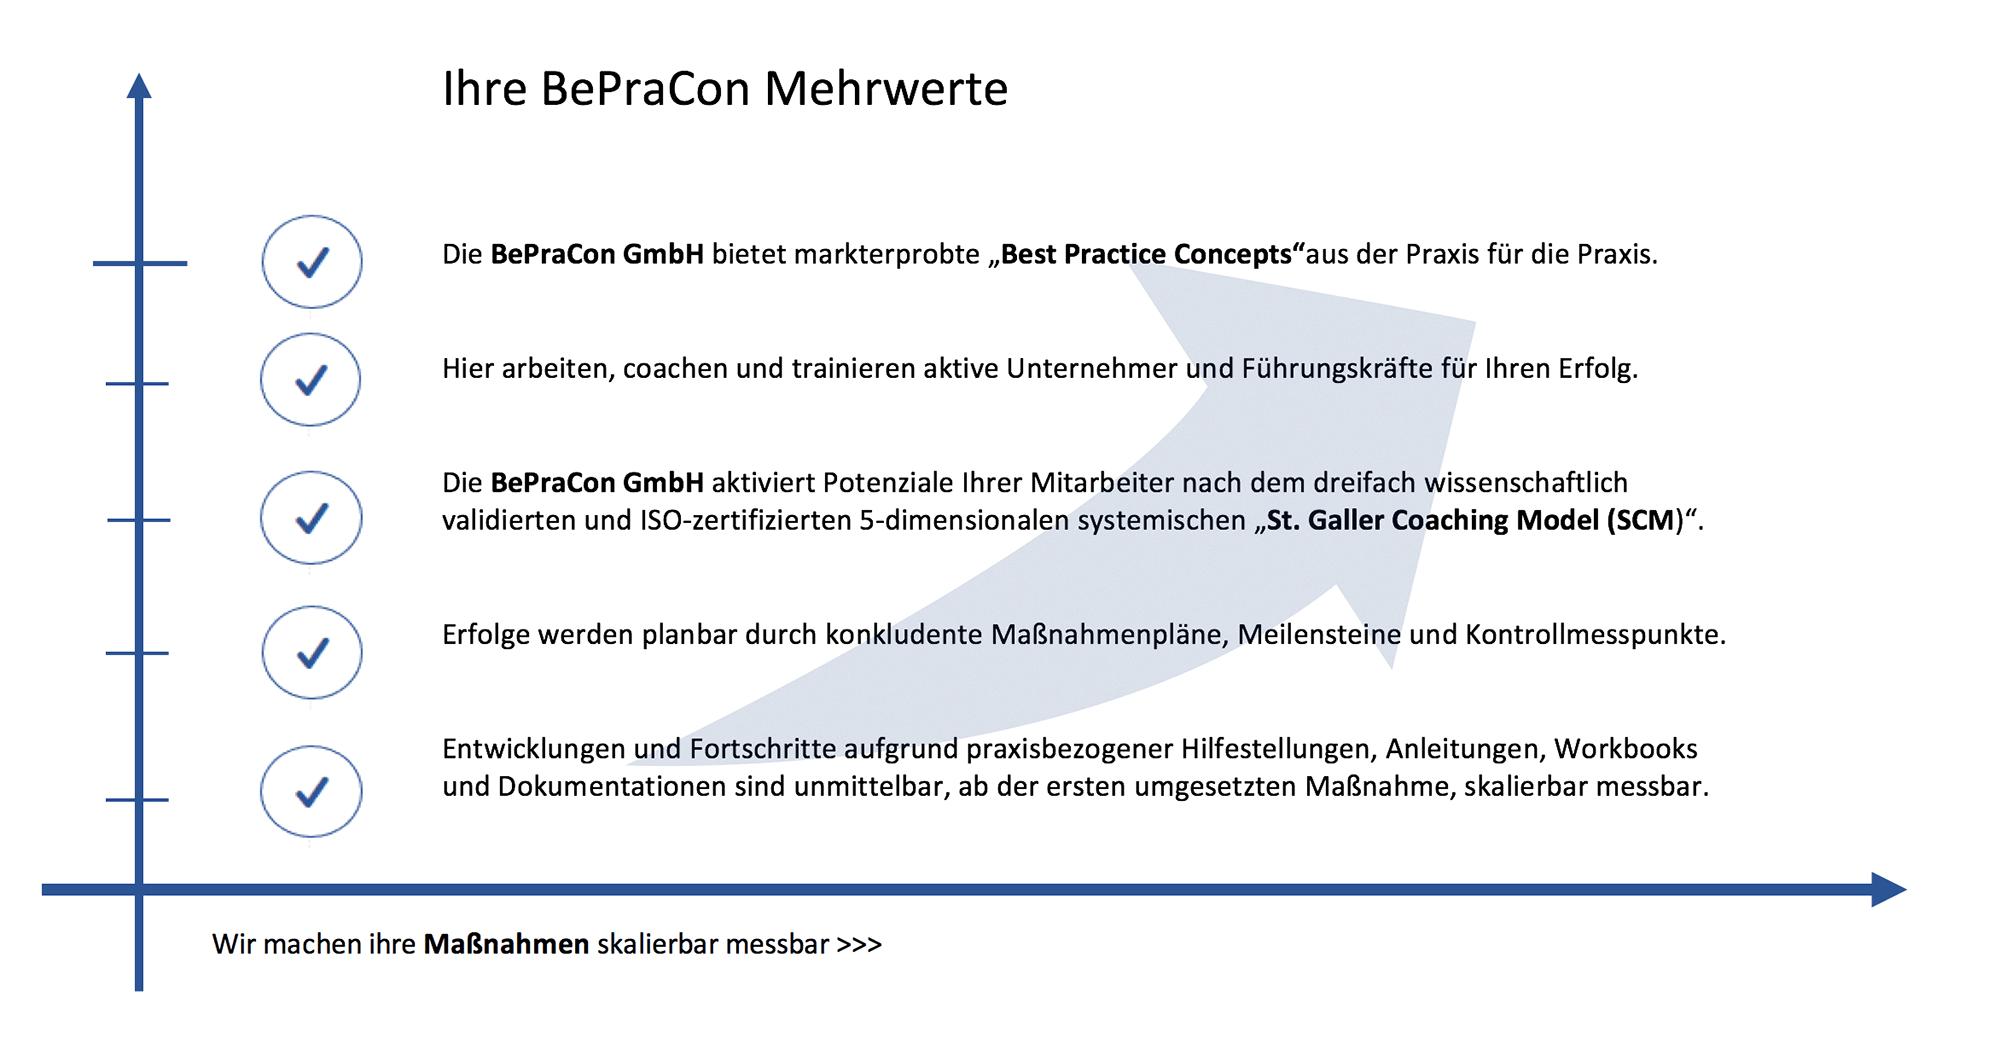 BePraCon-Mehrwerte Vertriebstraining | Vertriebscoaching | Businesscoaching